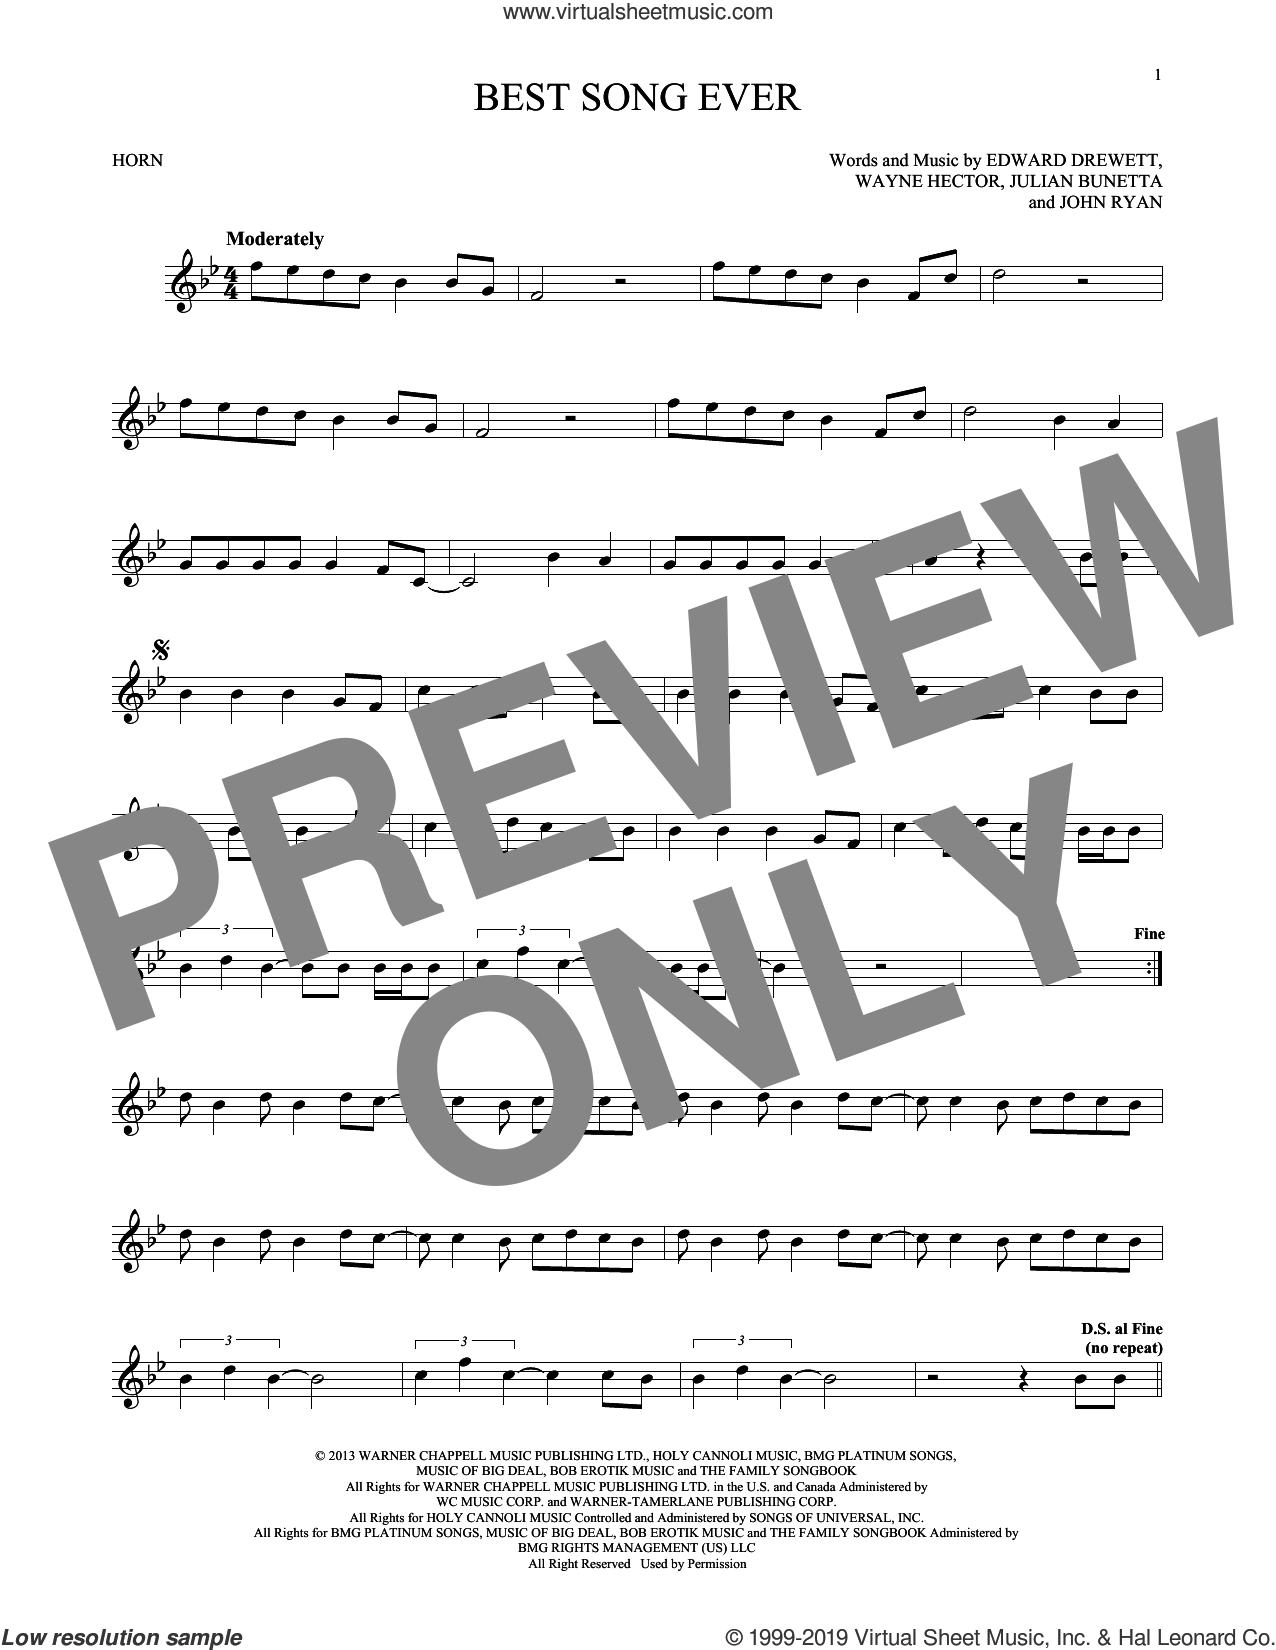 Best Song Ever sheet music for horn solo by One Direction, Edward Drewett, John Ryan, Julian Bunetta and Wayne Hector, intermediate skill level